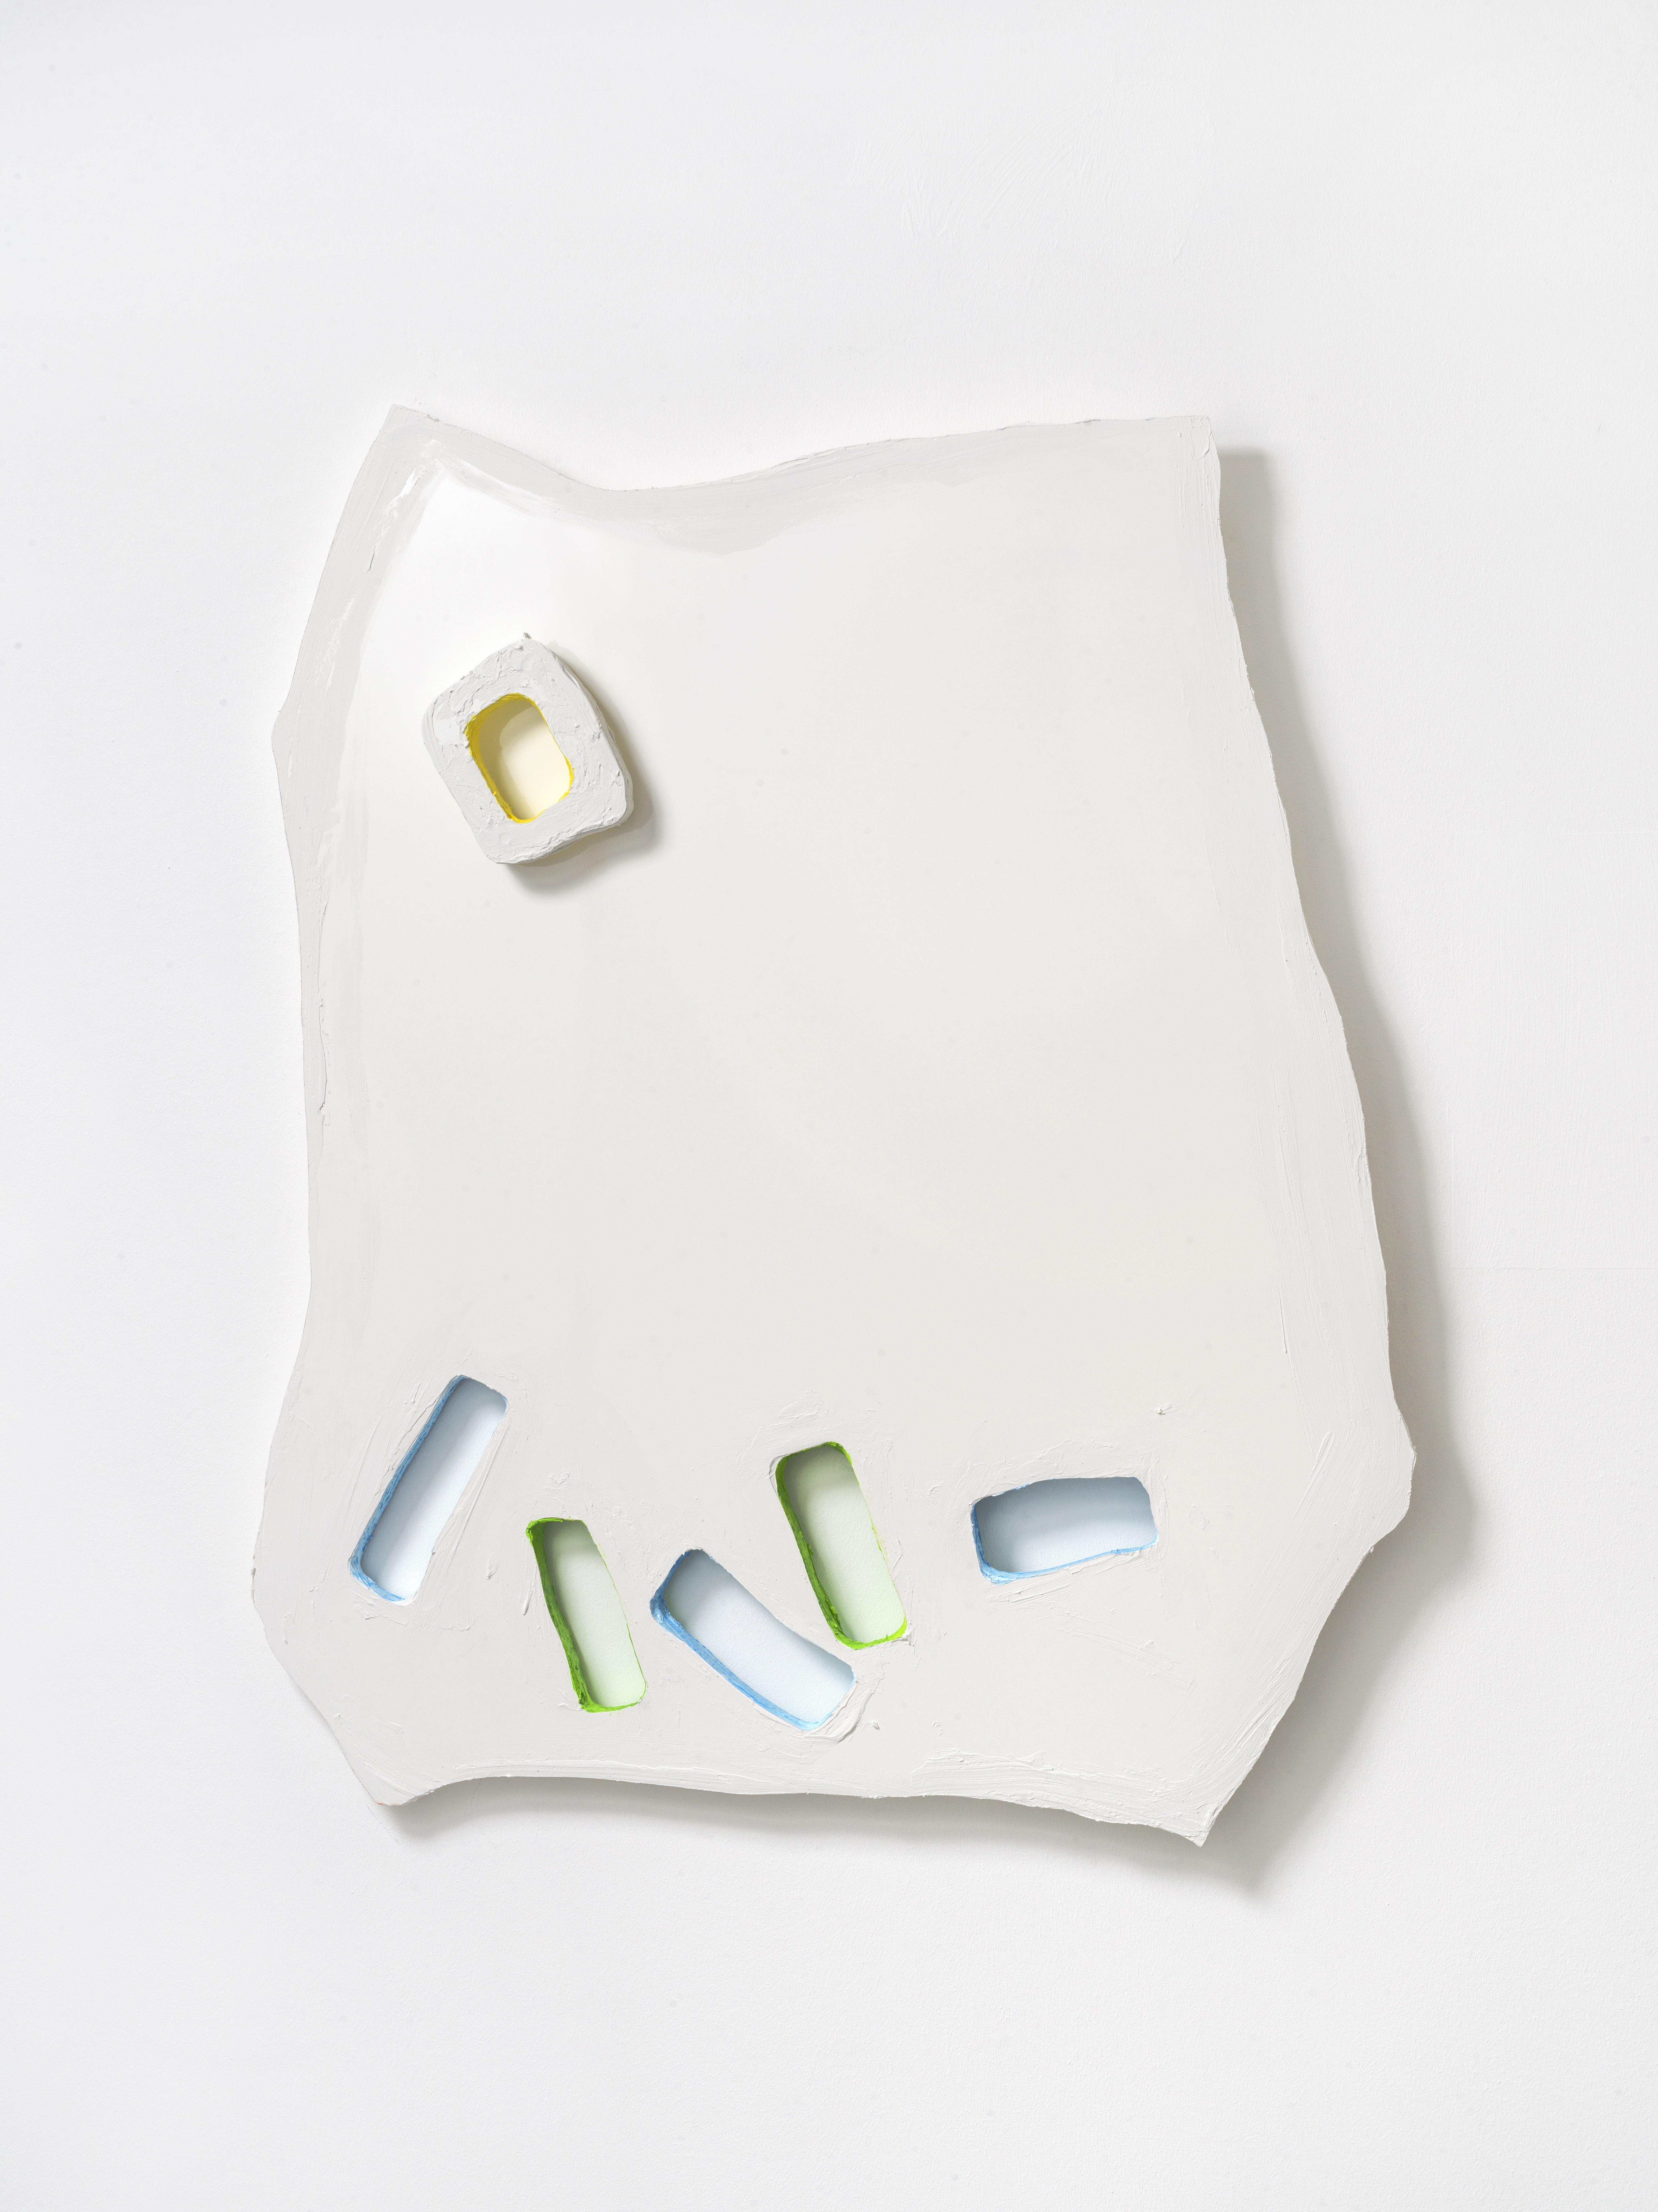 1. Adrian Altintas - AAD021 - 2021 - Untitled 101,5 x 118,5 x 6,5 cm. - Sandwichpanel, Acryl.